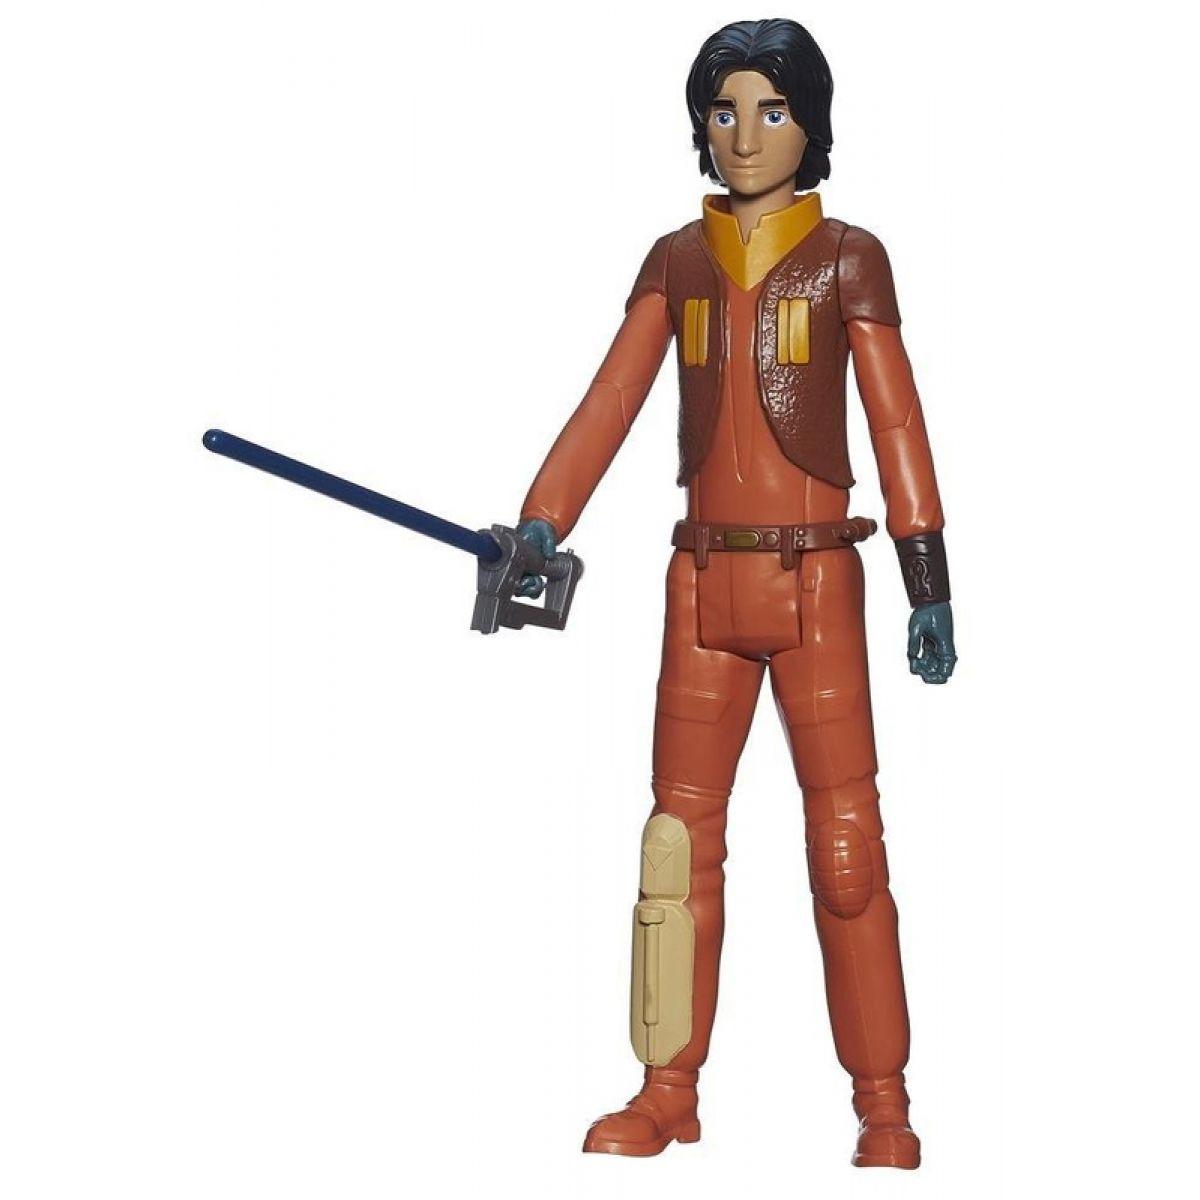 Hasbro Star Wars figurka 30cm - Ezra Bridger